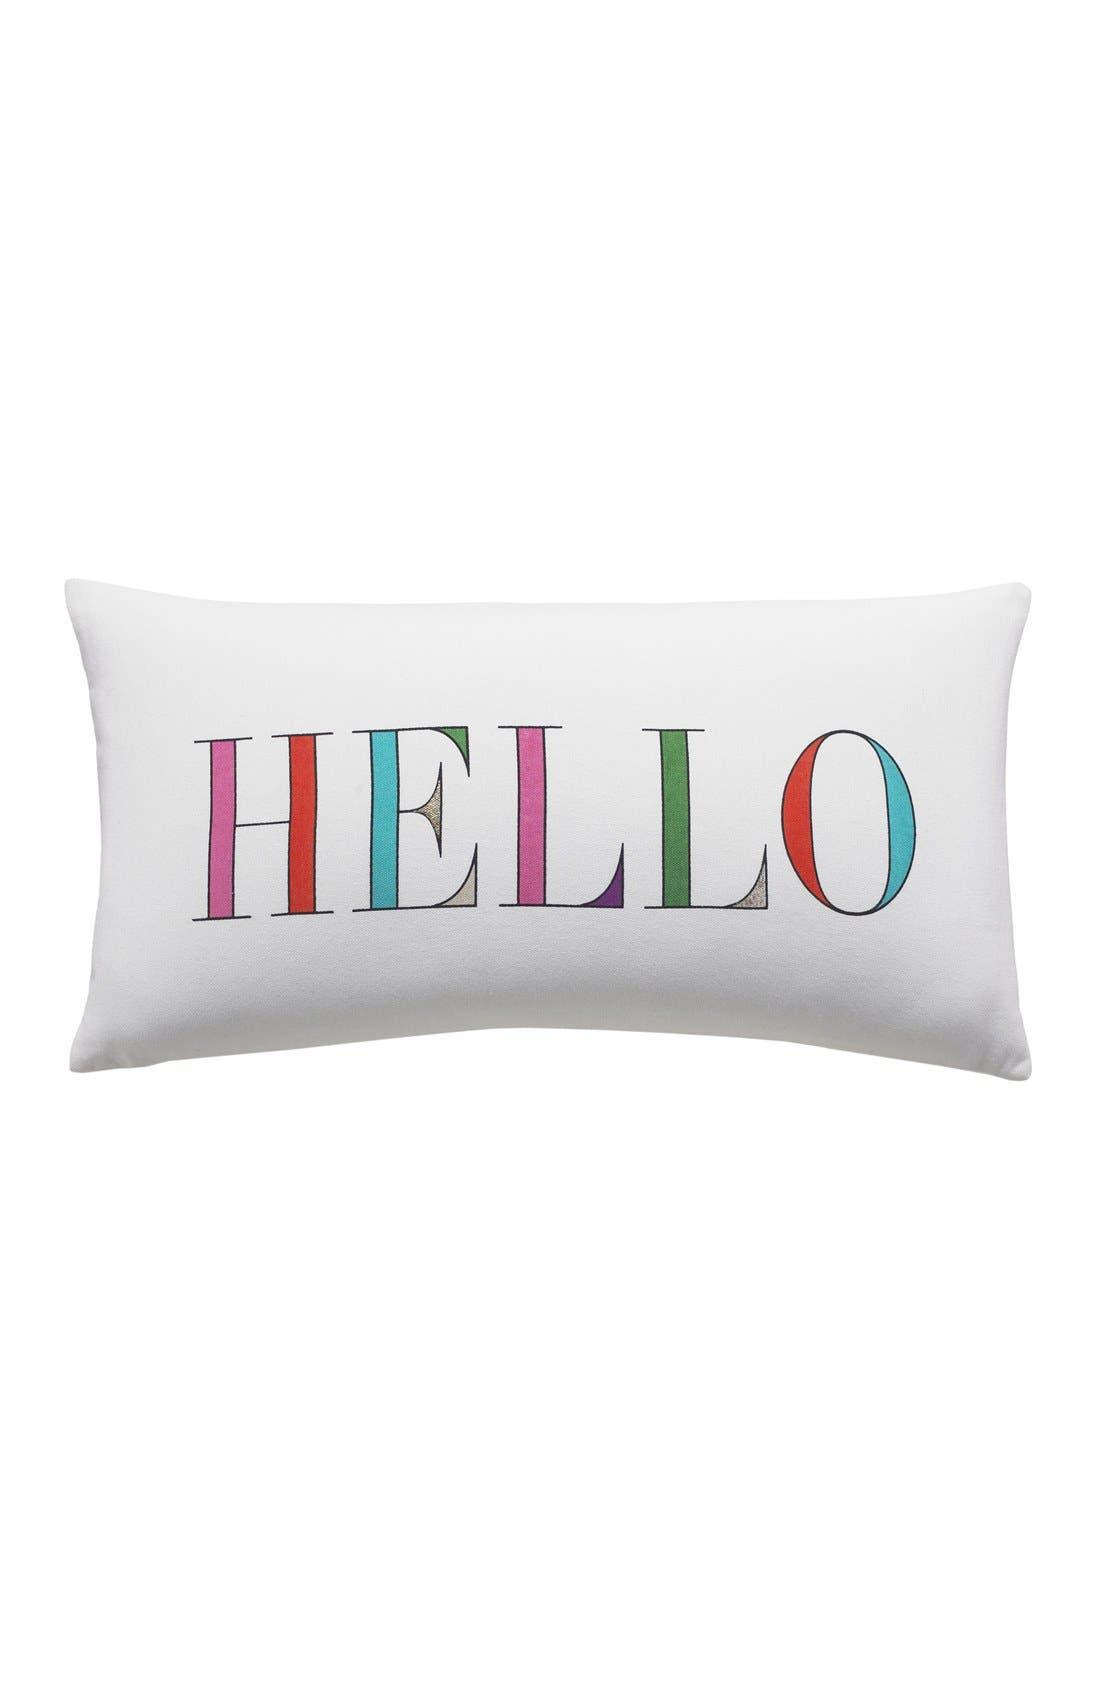 kate spade new york 'hello' accent pillow